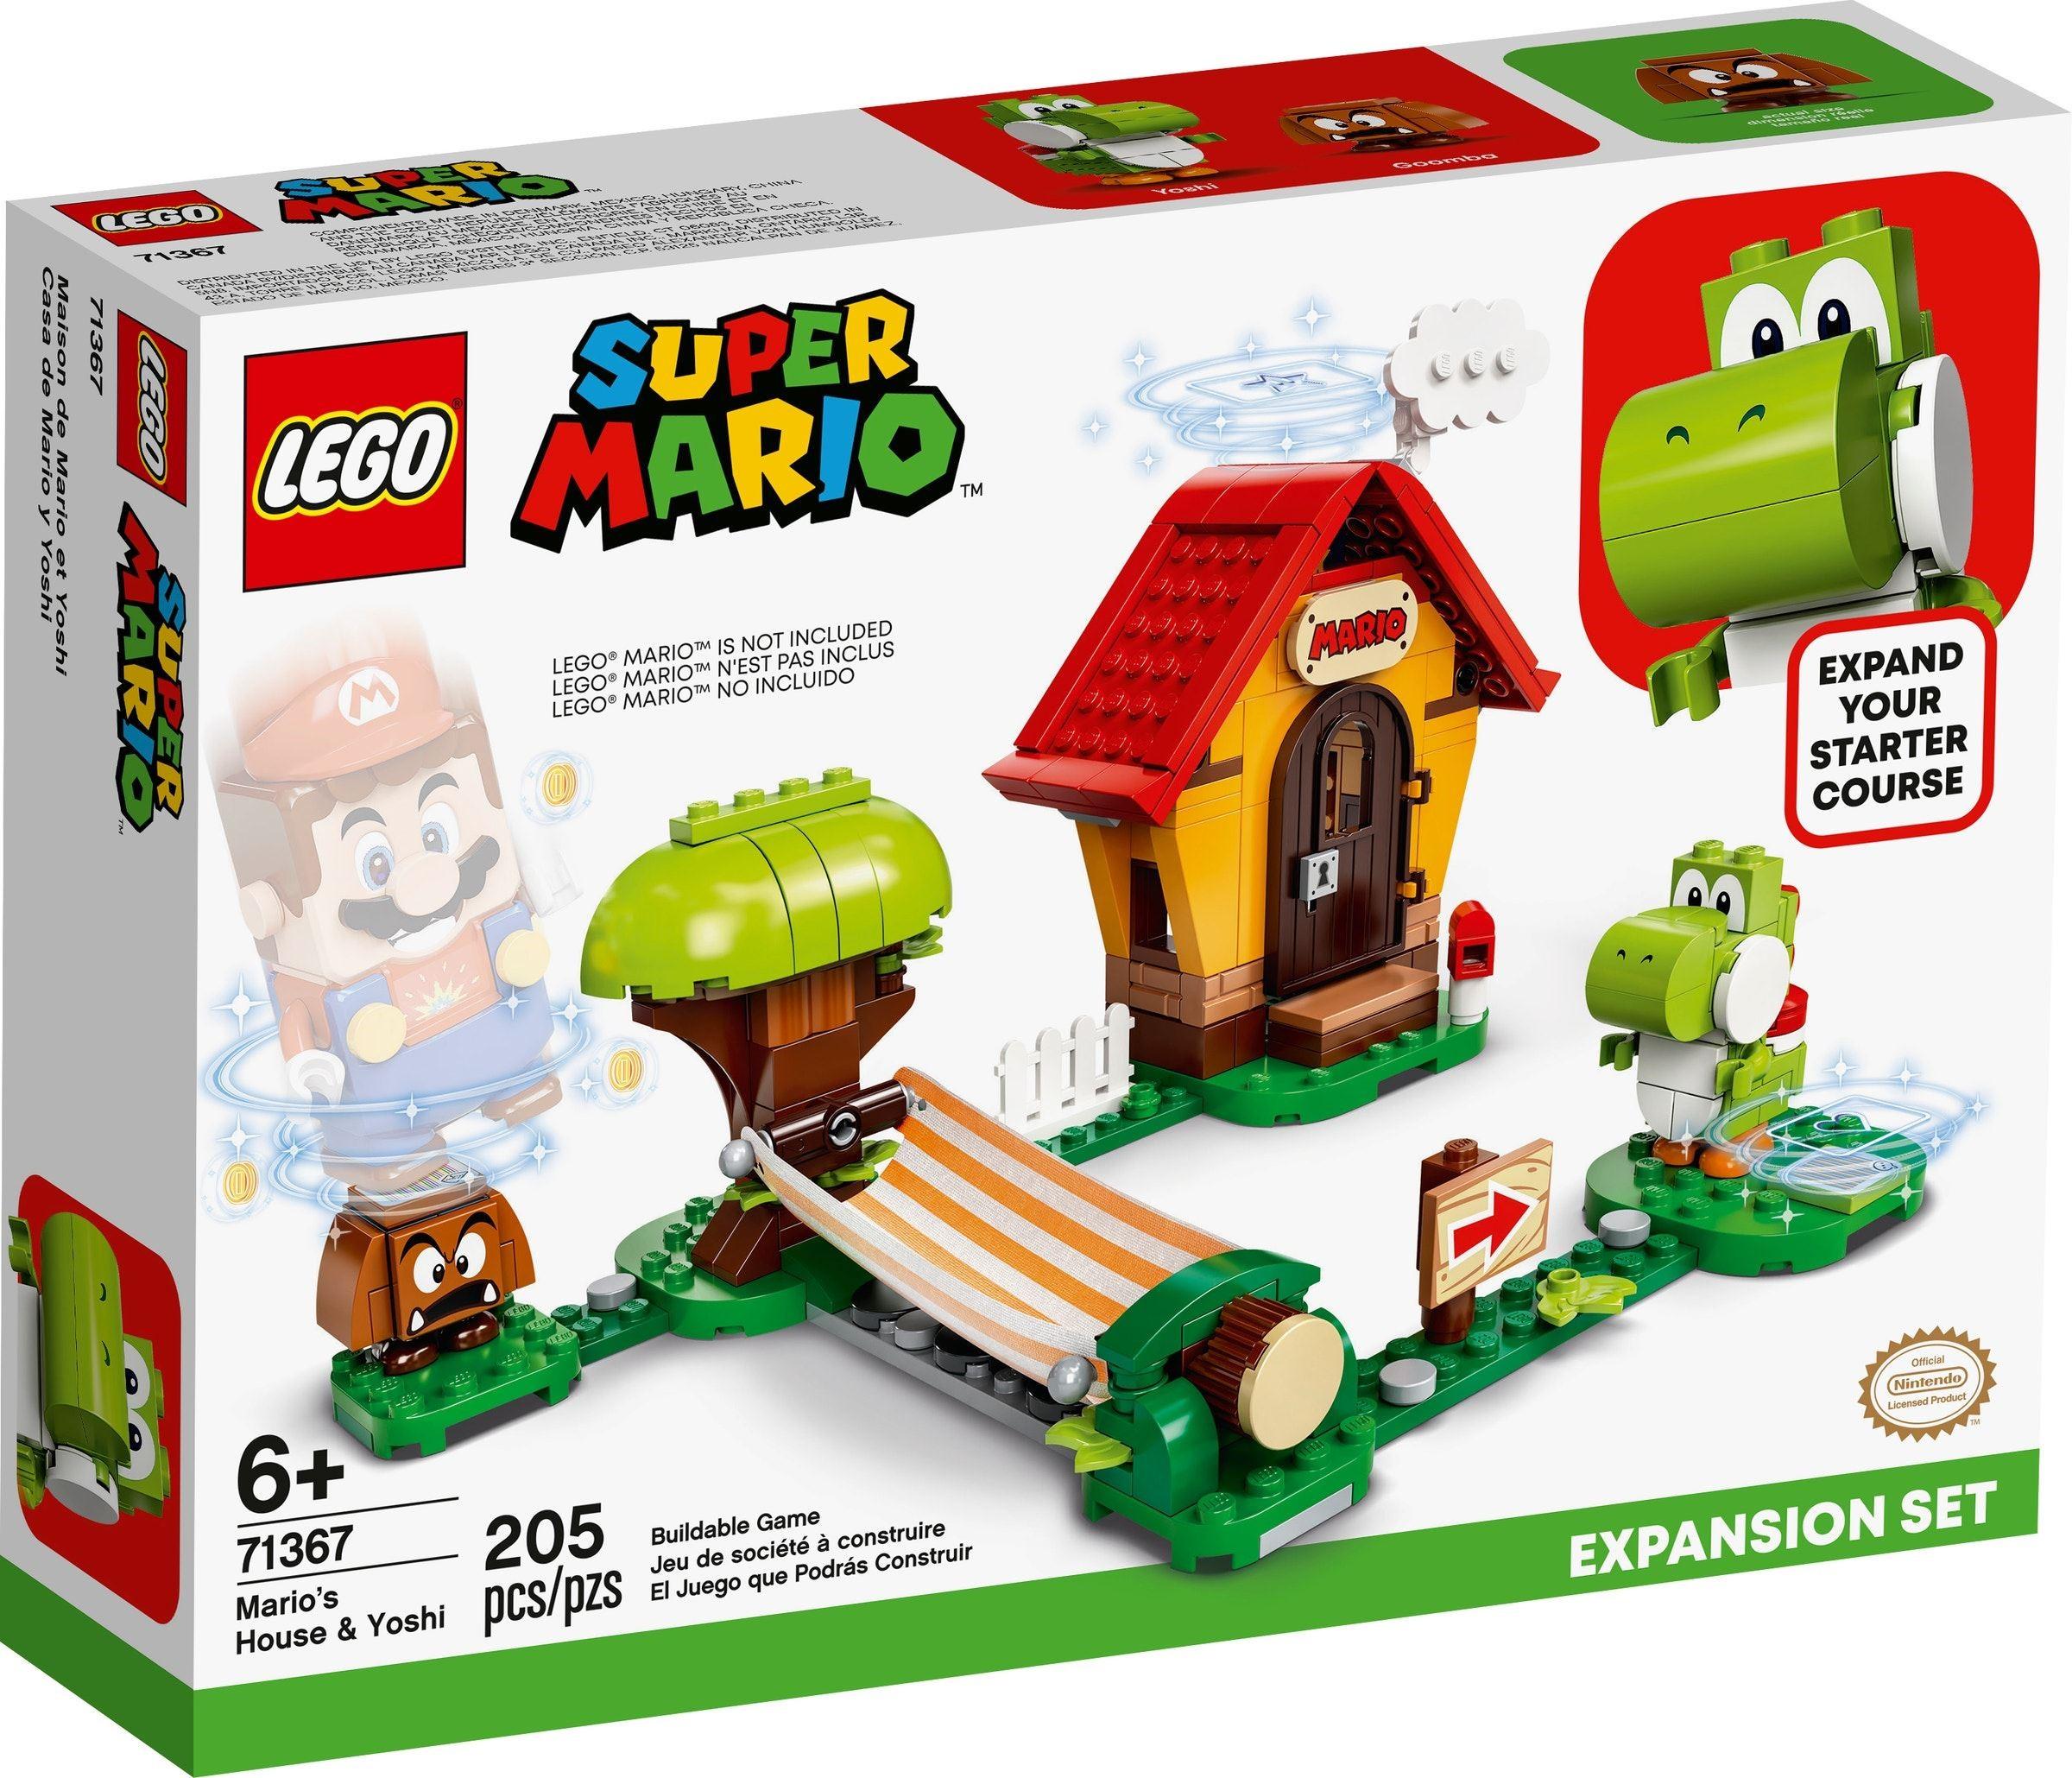 LEGO Super Mario - Mario's House & Yoshi Expansion Set (71367)